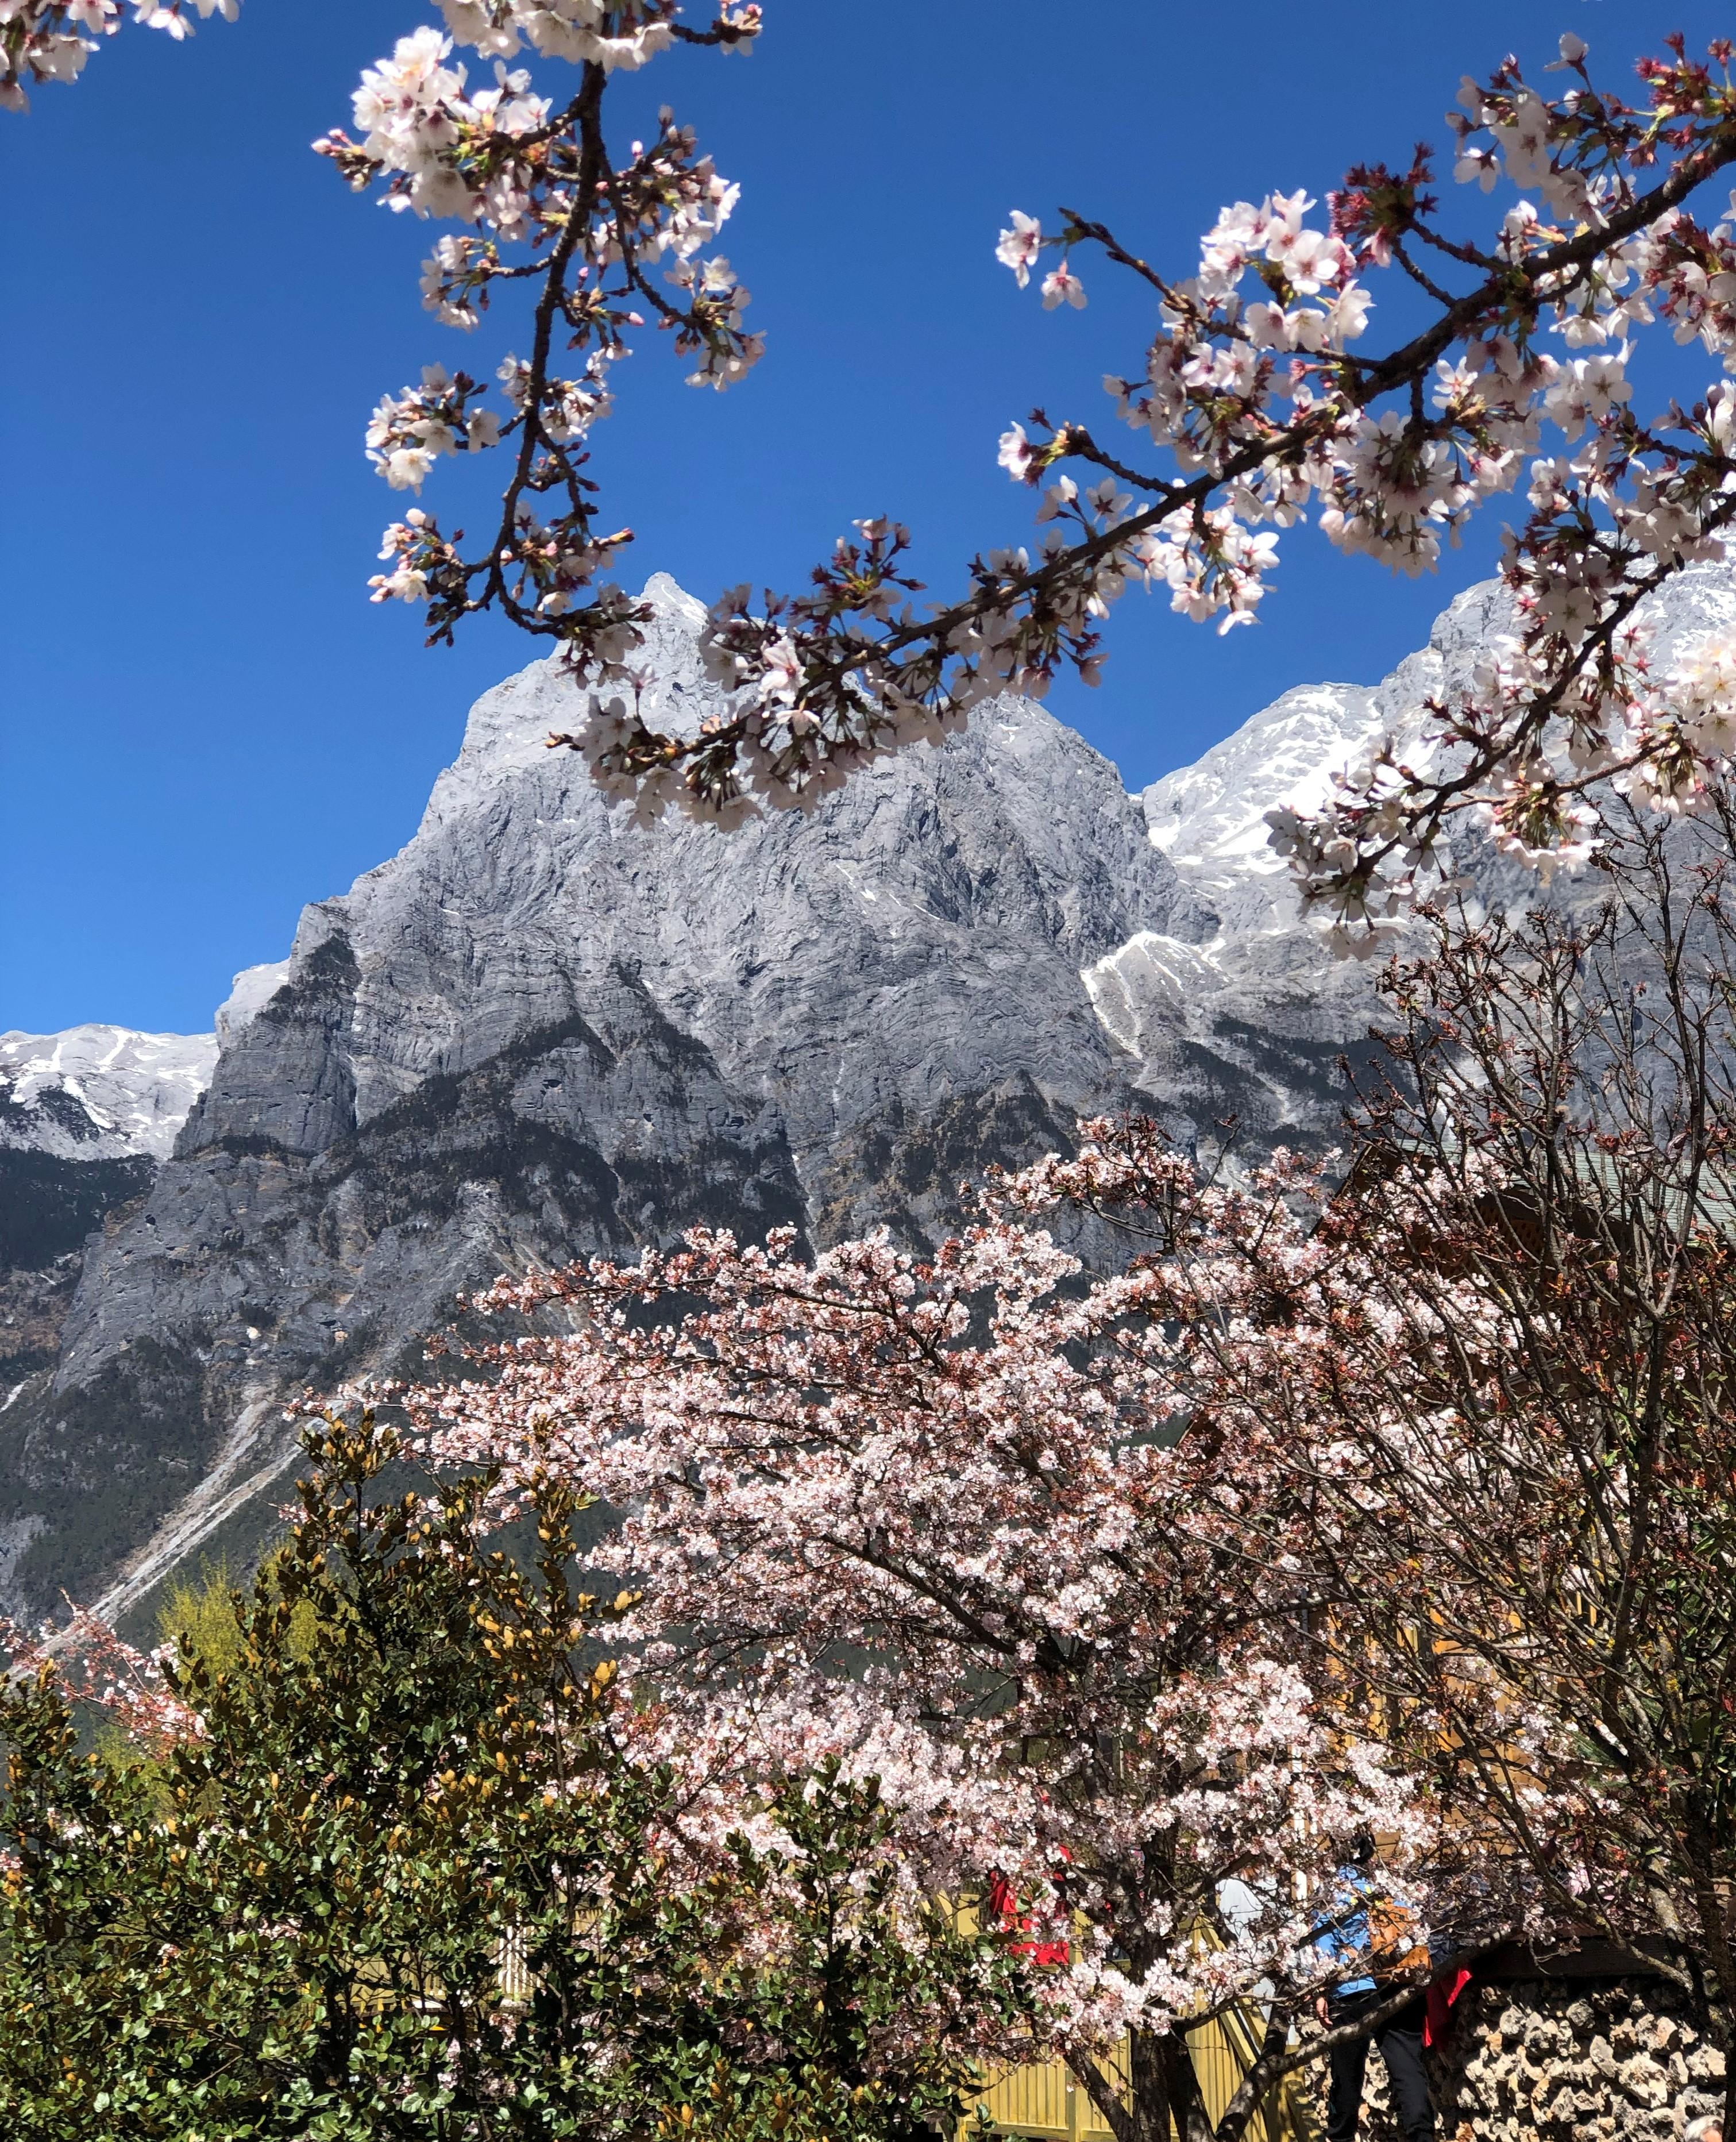 Lijiang Yulong Snow Mountain One Day Tour [Glacier Park & Blue Moon Valley & Impression Lijiang Show & Yushui Village]